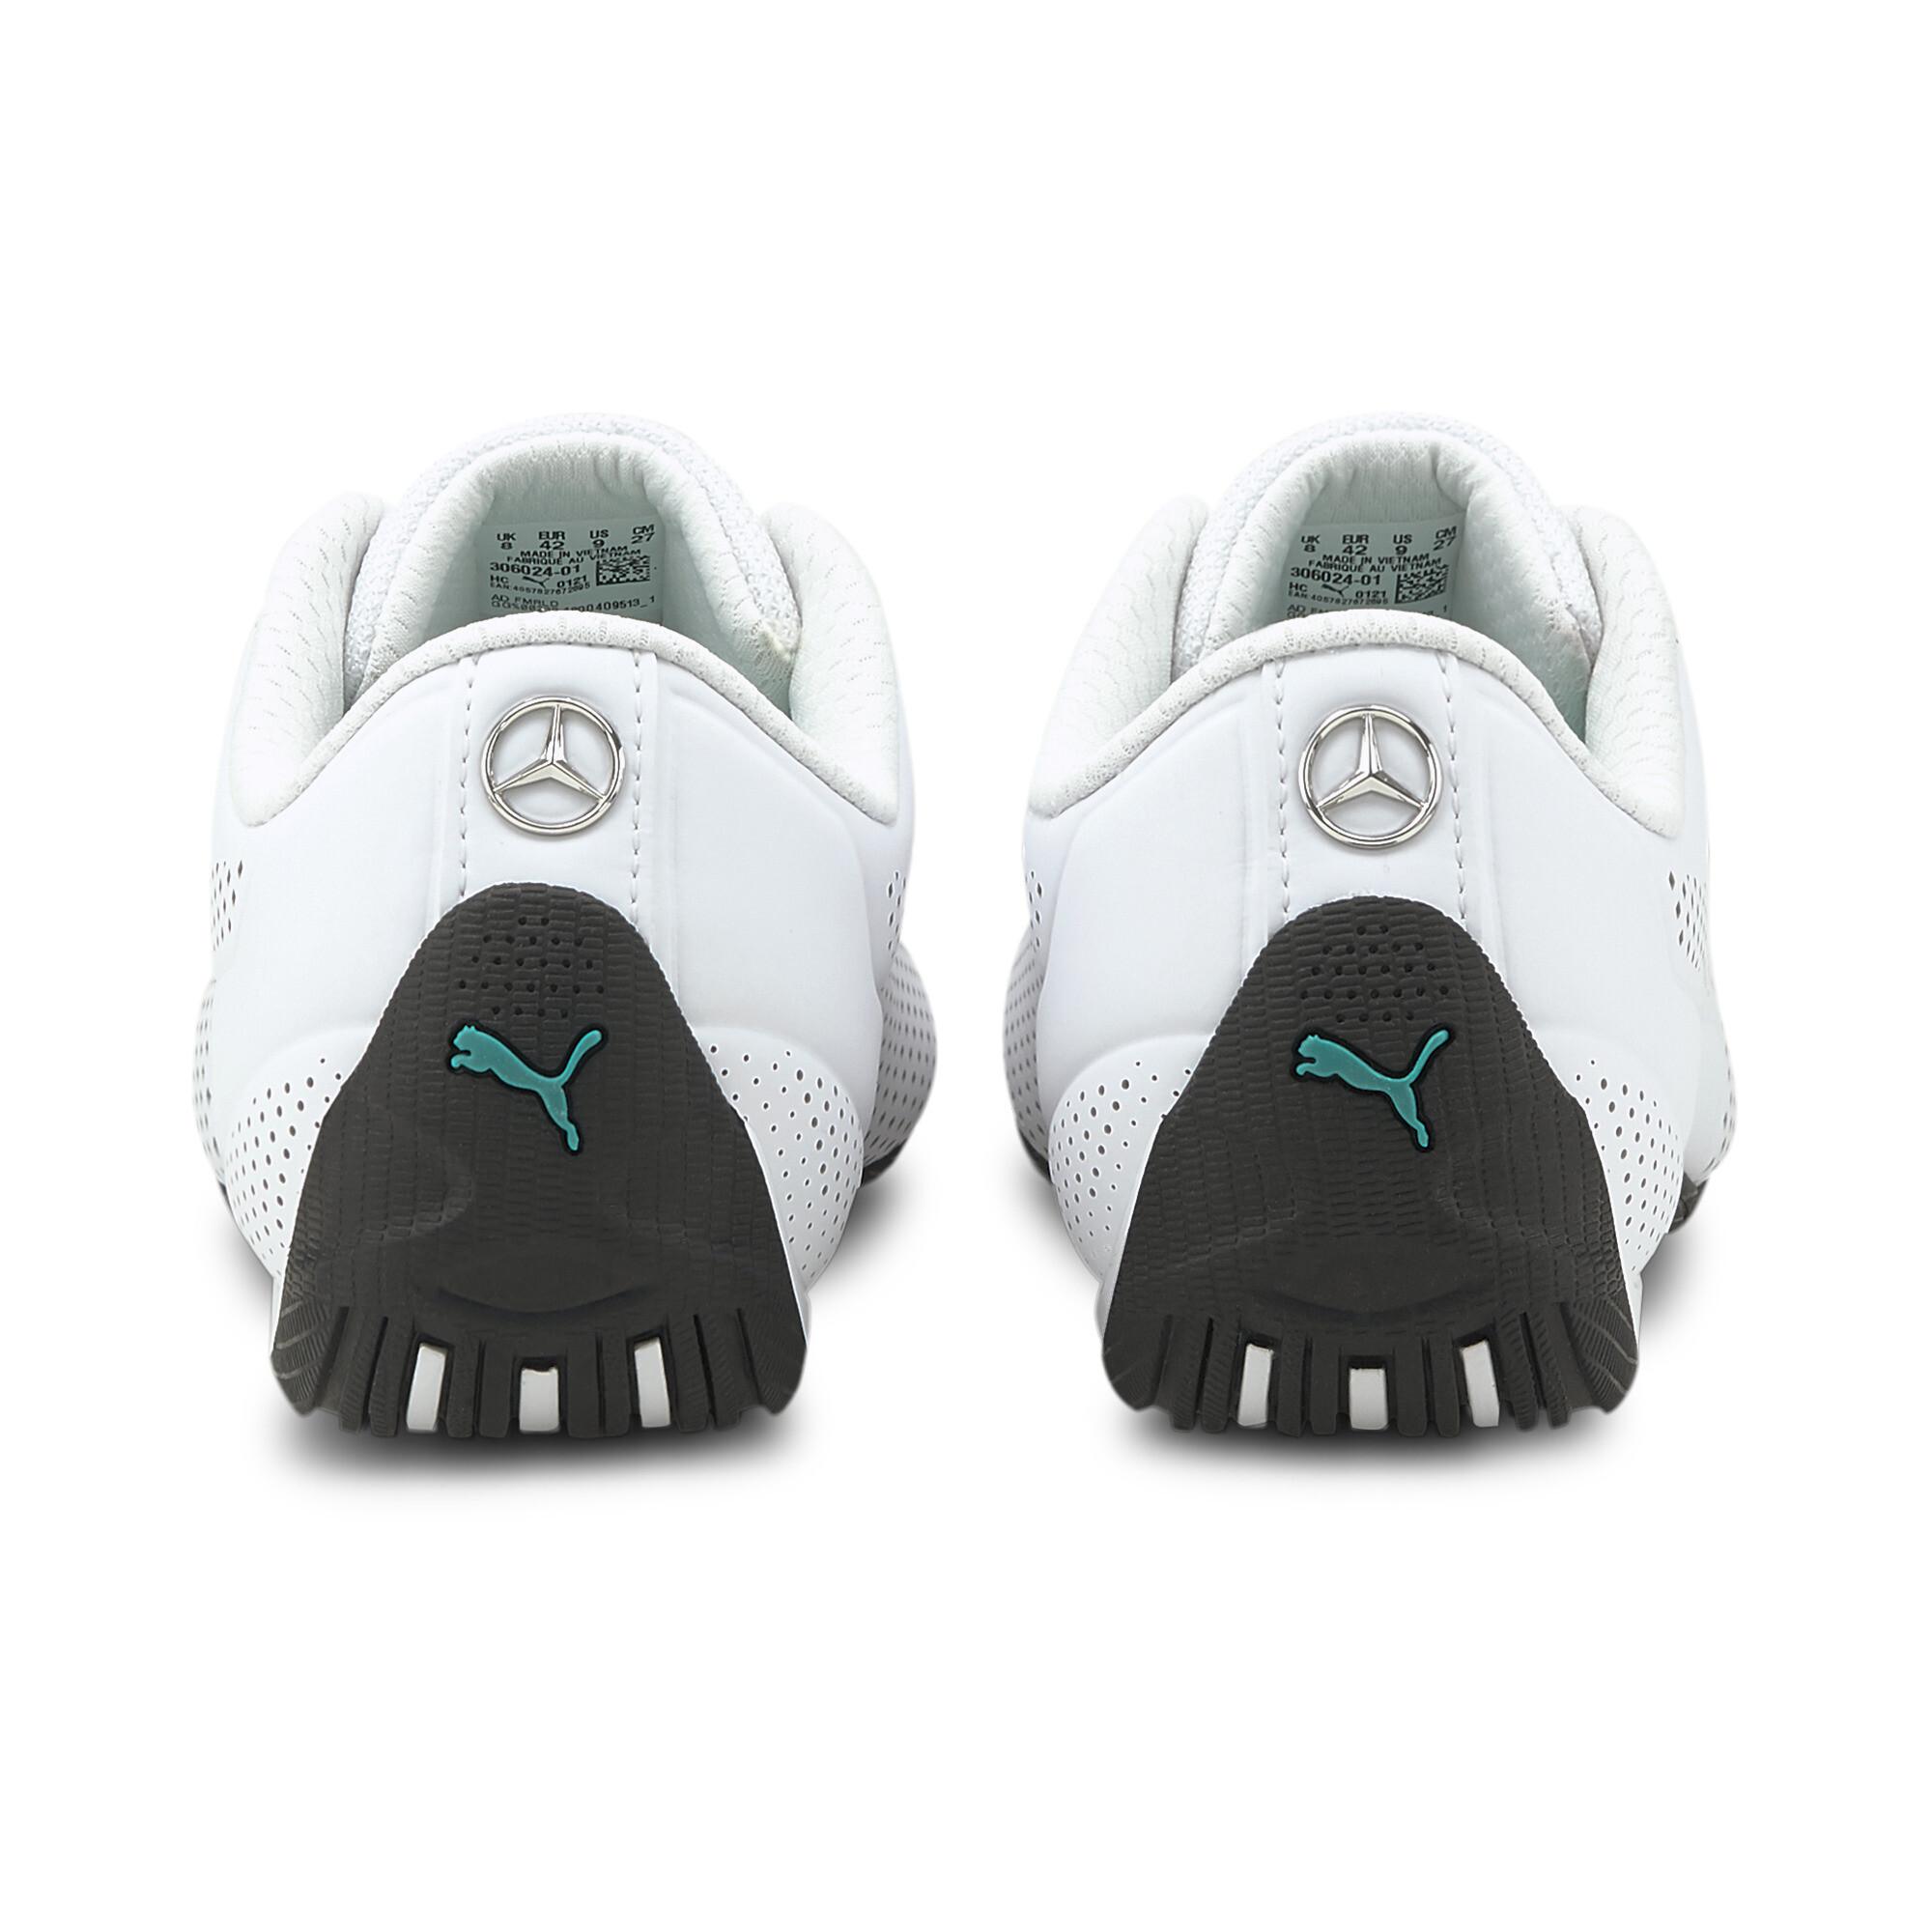 PUMA-MERCEDES-AMG-PETRONAS-Drift-Cat-Ultra-Sneaker-Unisex-Schuhe-Neu Indexbild 20